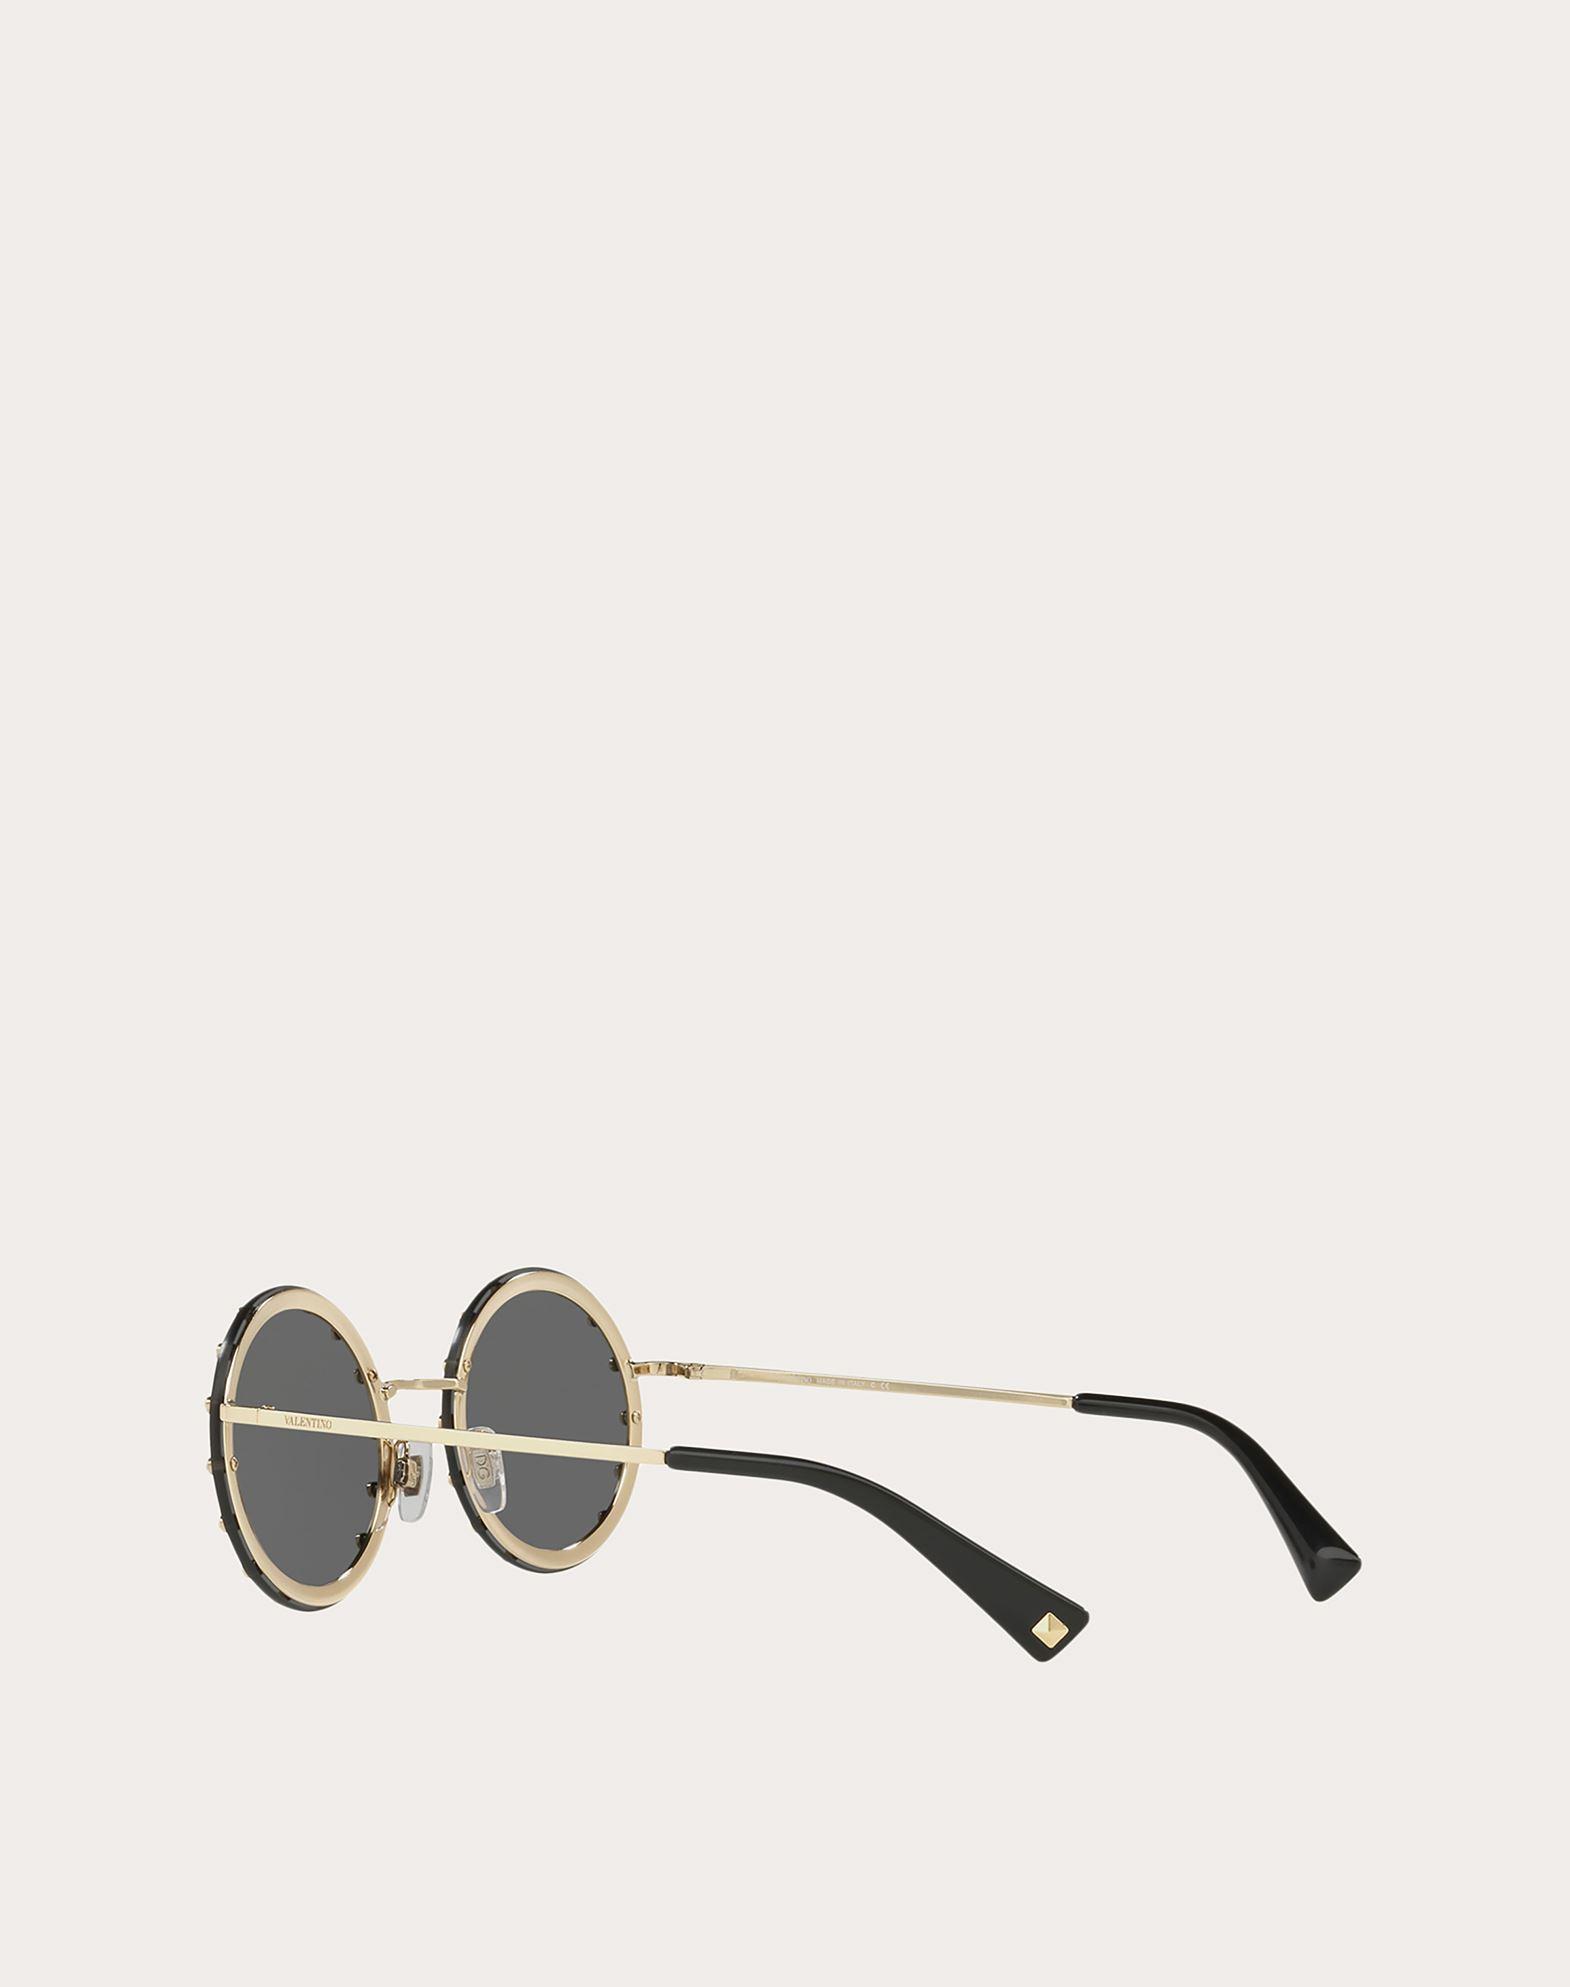 VALENTINO OCCHIALI Metal Sunglasses Sunglasses D e